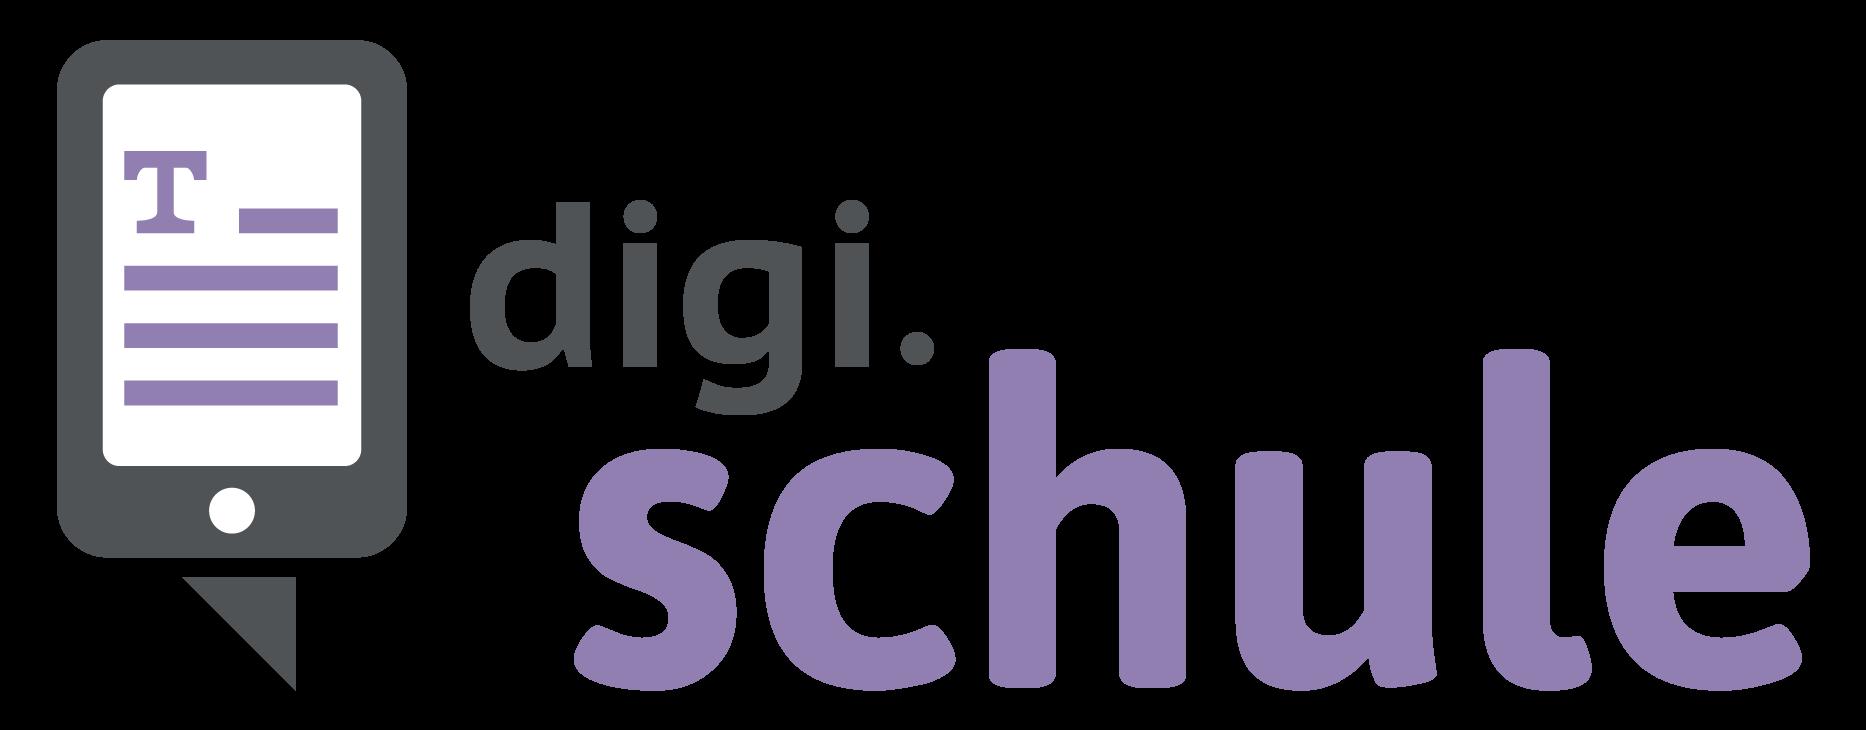 digi.schule